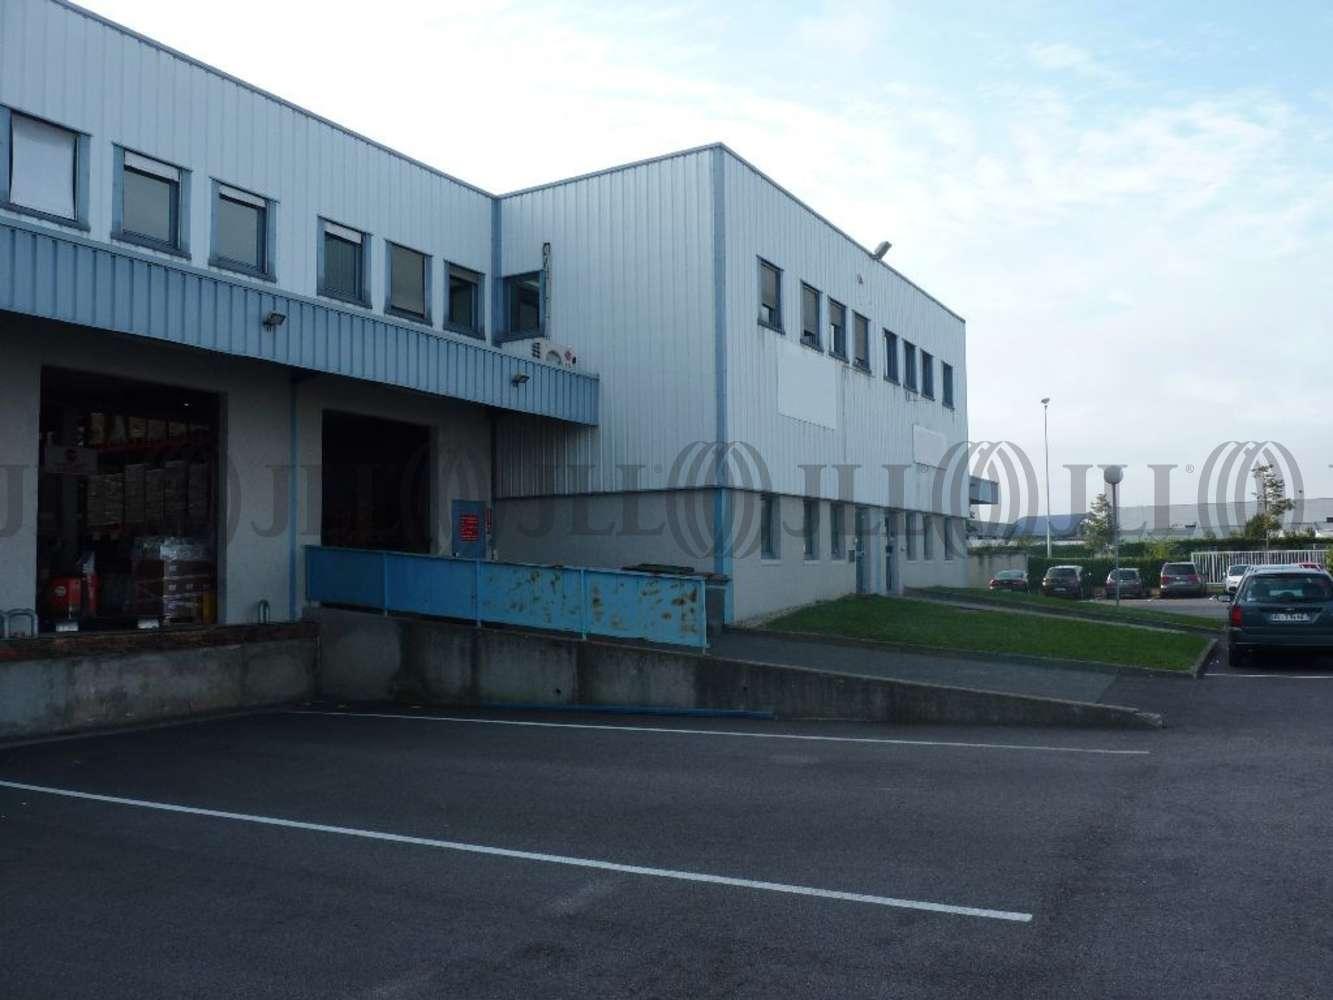 Activités/entrepôt Genas, 69740 - Location entrepot Genas - Lyon Est (69)